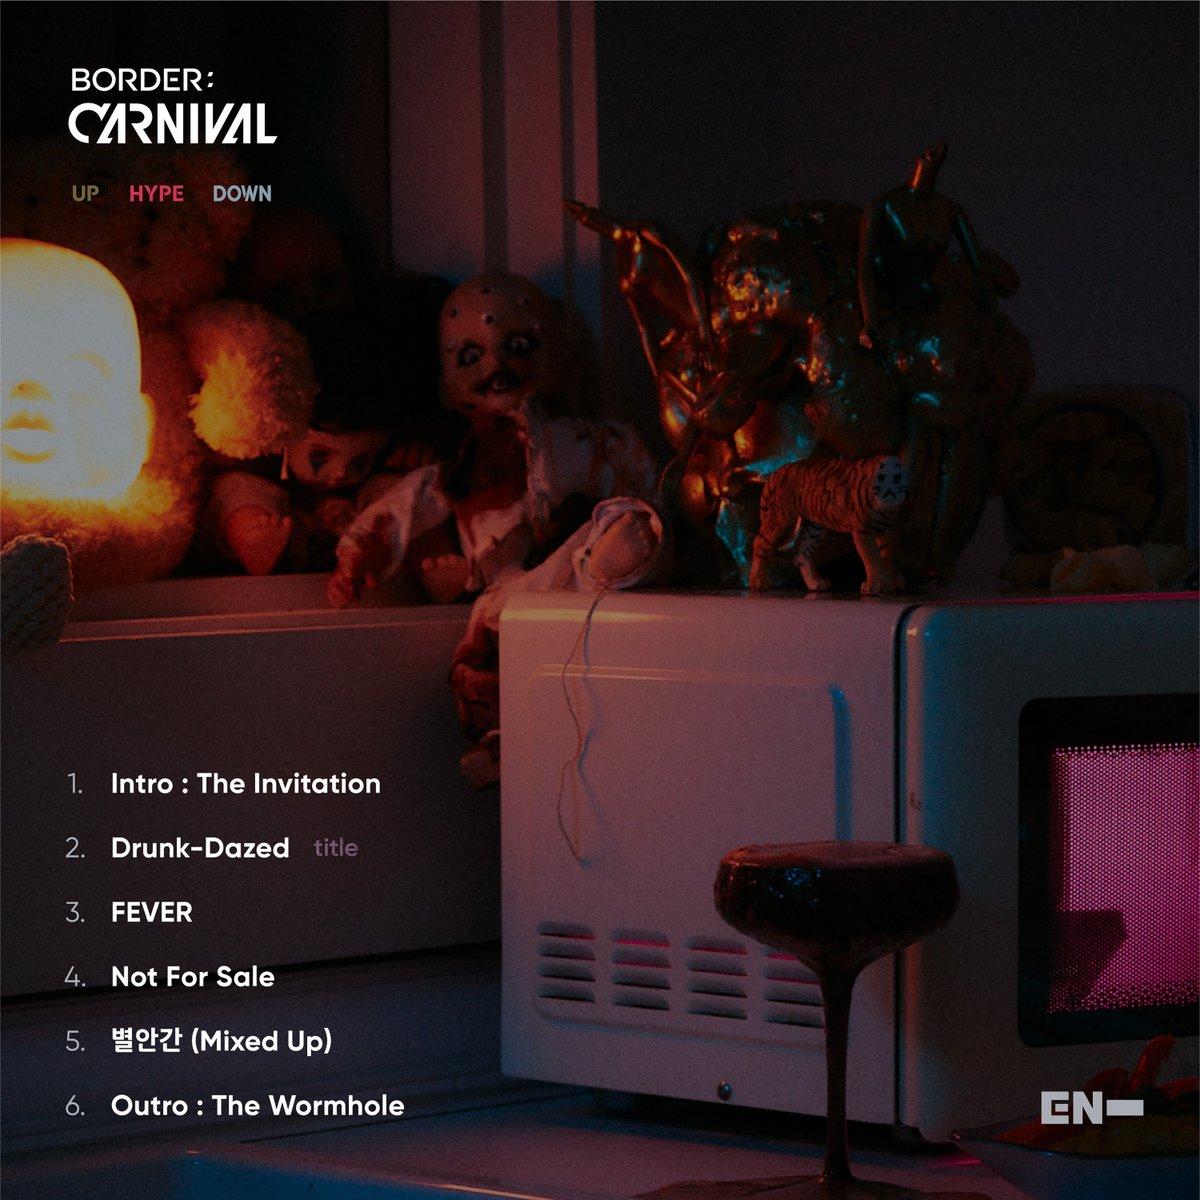 #ENHYPEN BORDER : CARNIVAL Tracklist #BORDER_CARNIVAL